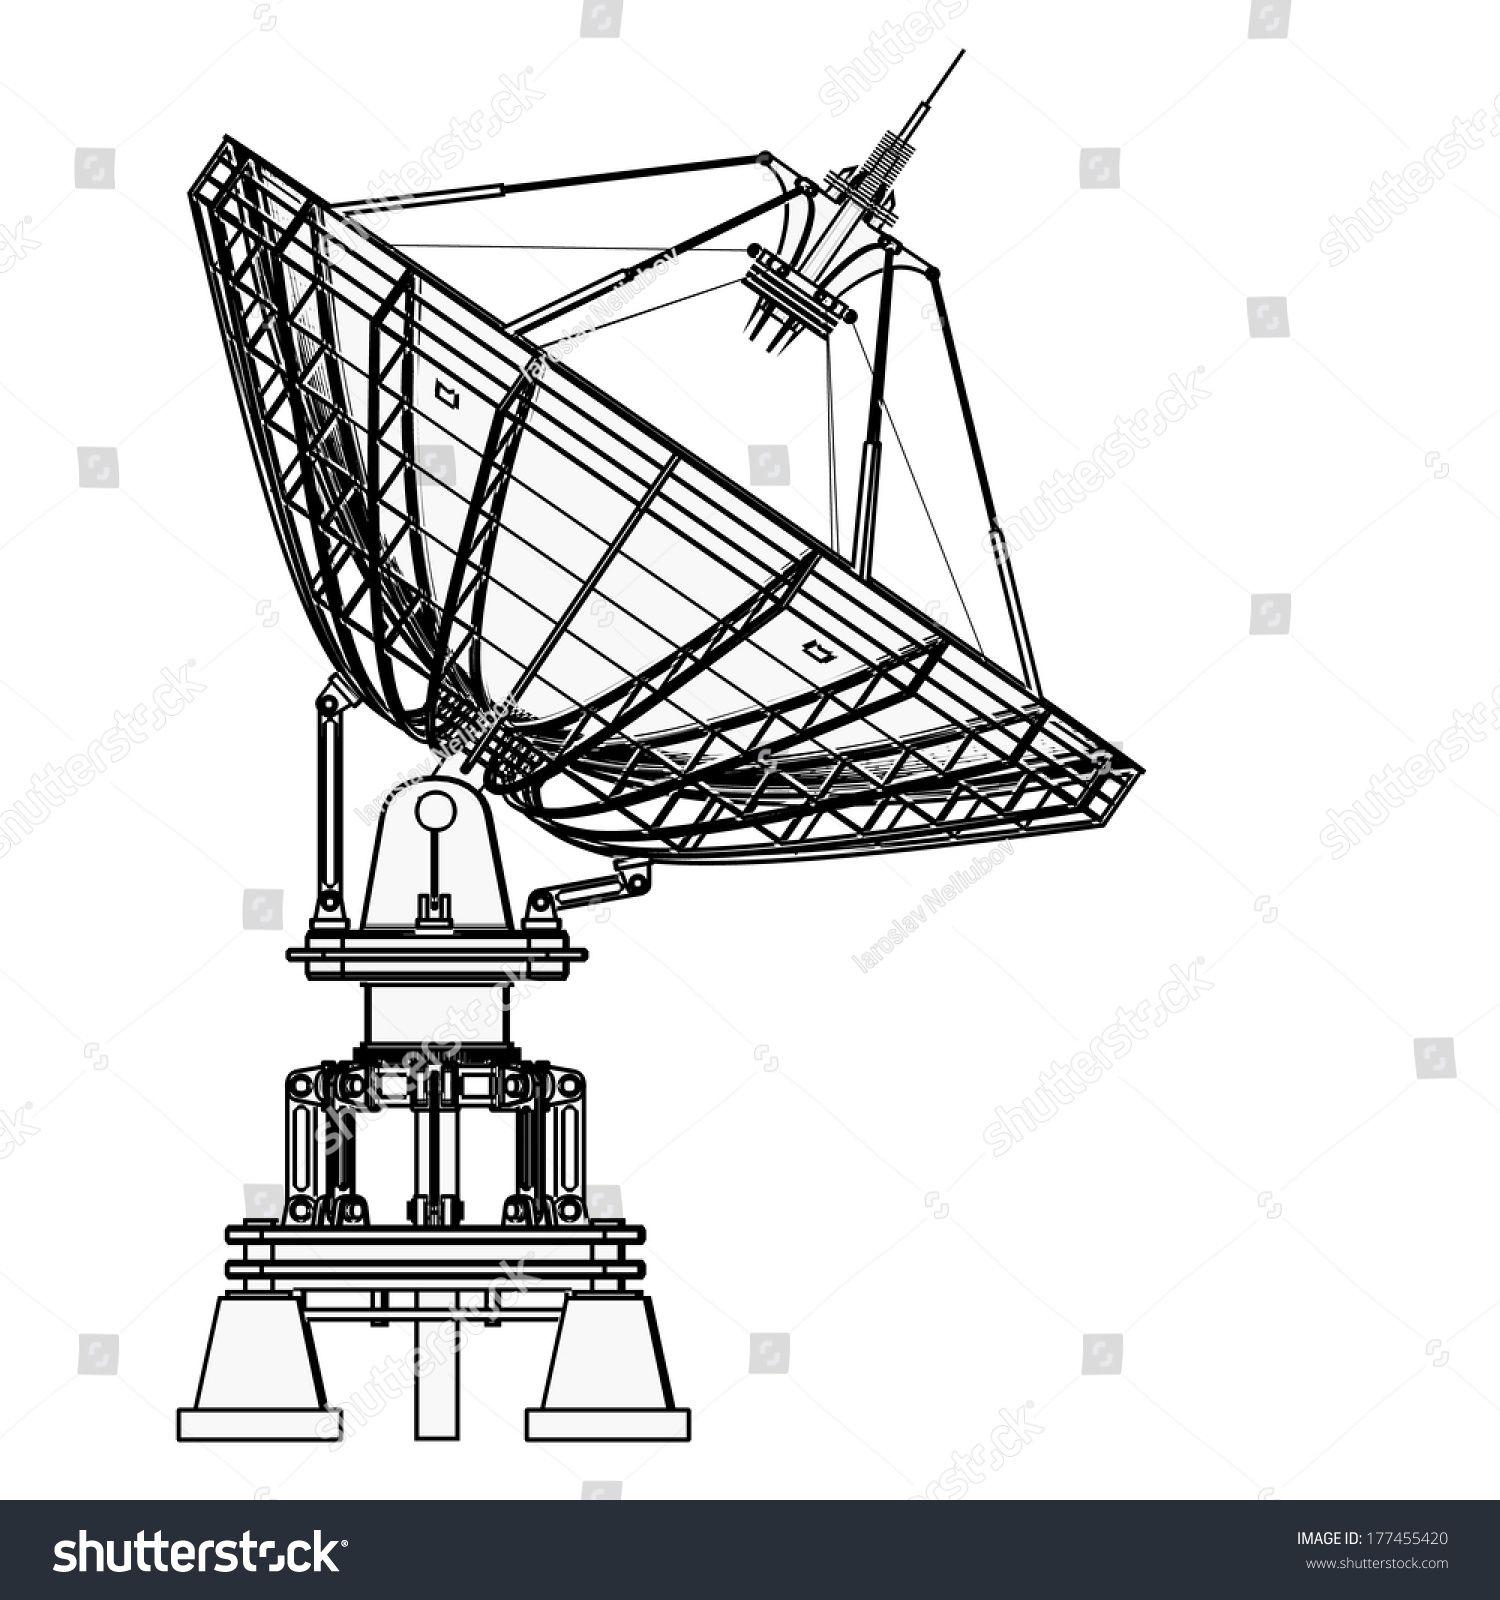 Http Image Shutterstock Com Z Stock Photo Satellite Dishes Antenna Doppler Radar Cartoon Illustration Outline High Resolution D 1774 Antenas Radar Astrologia